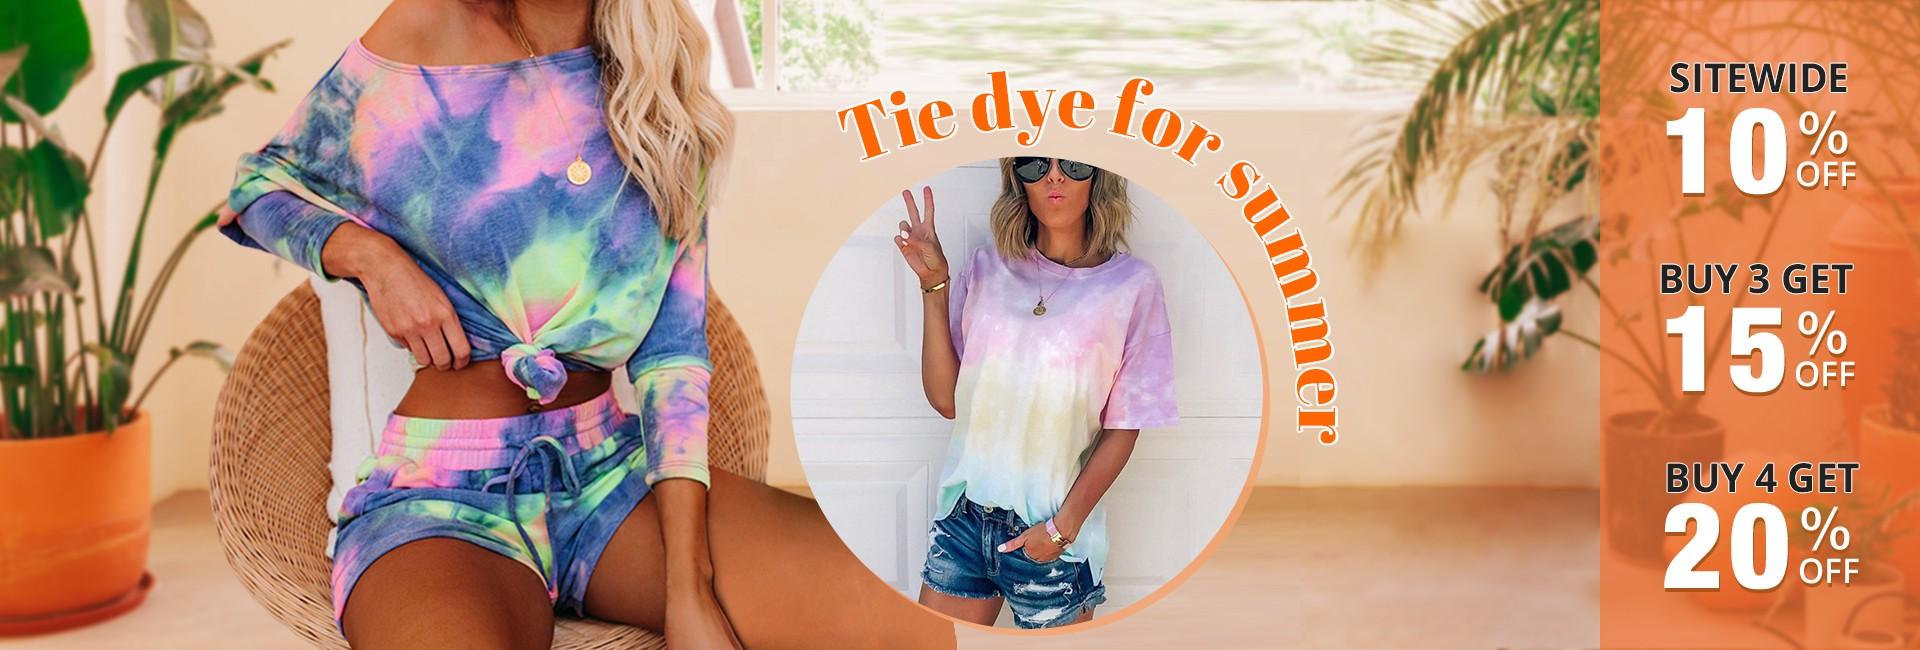 Tie dye for summer